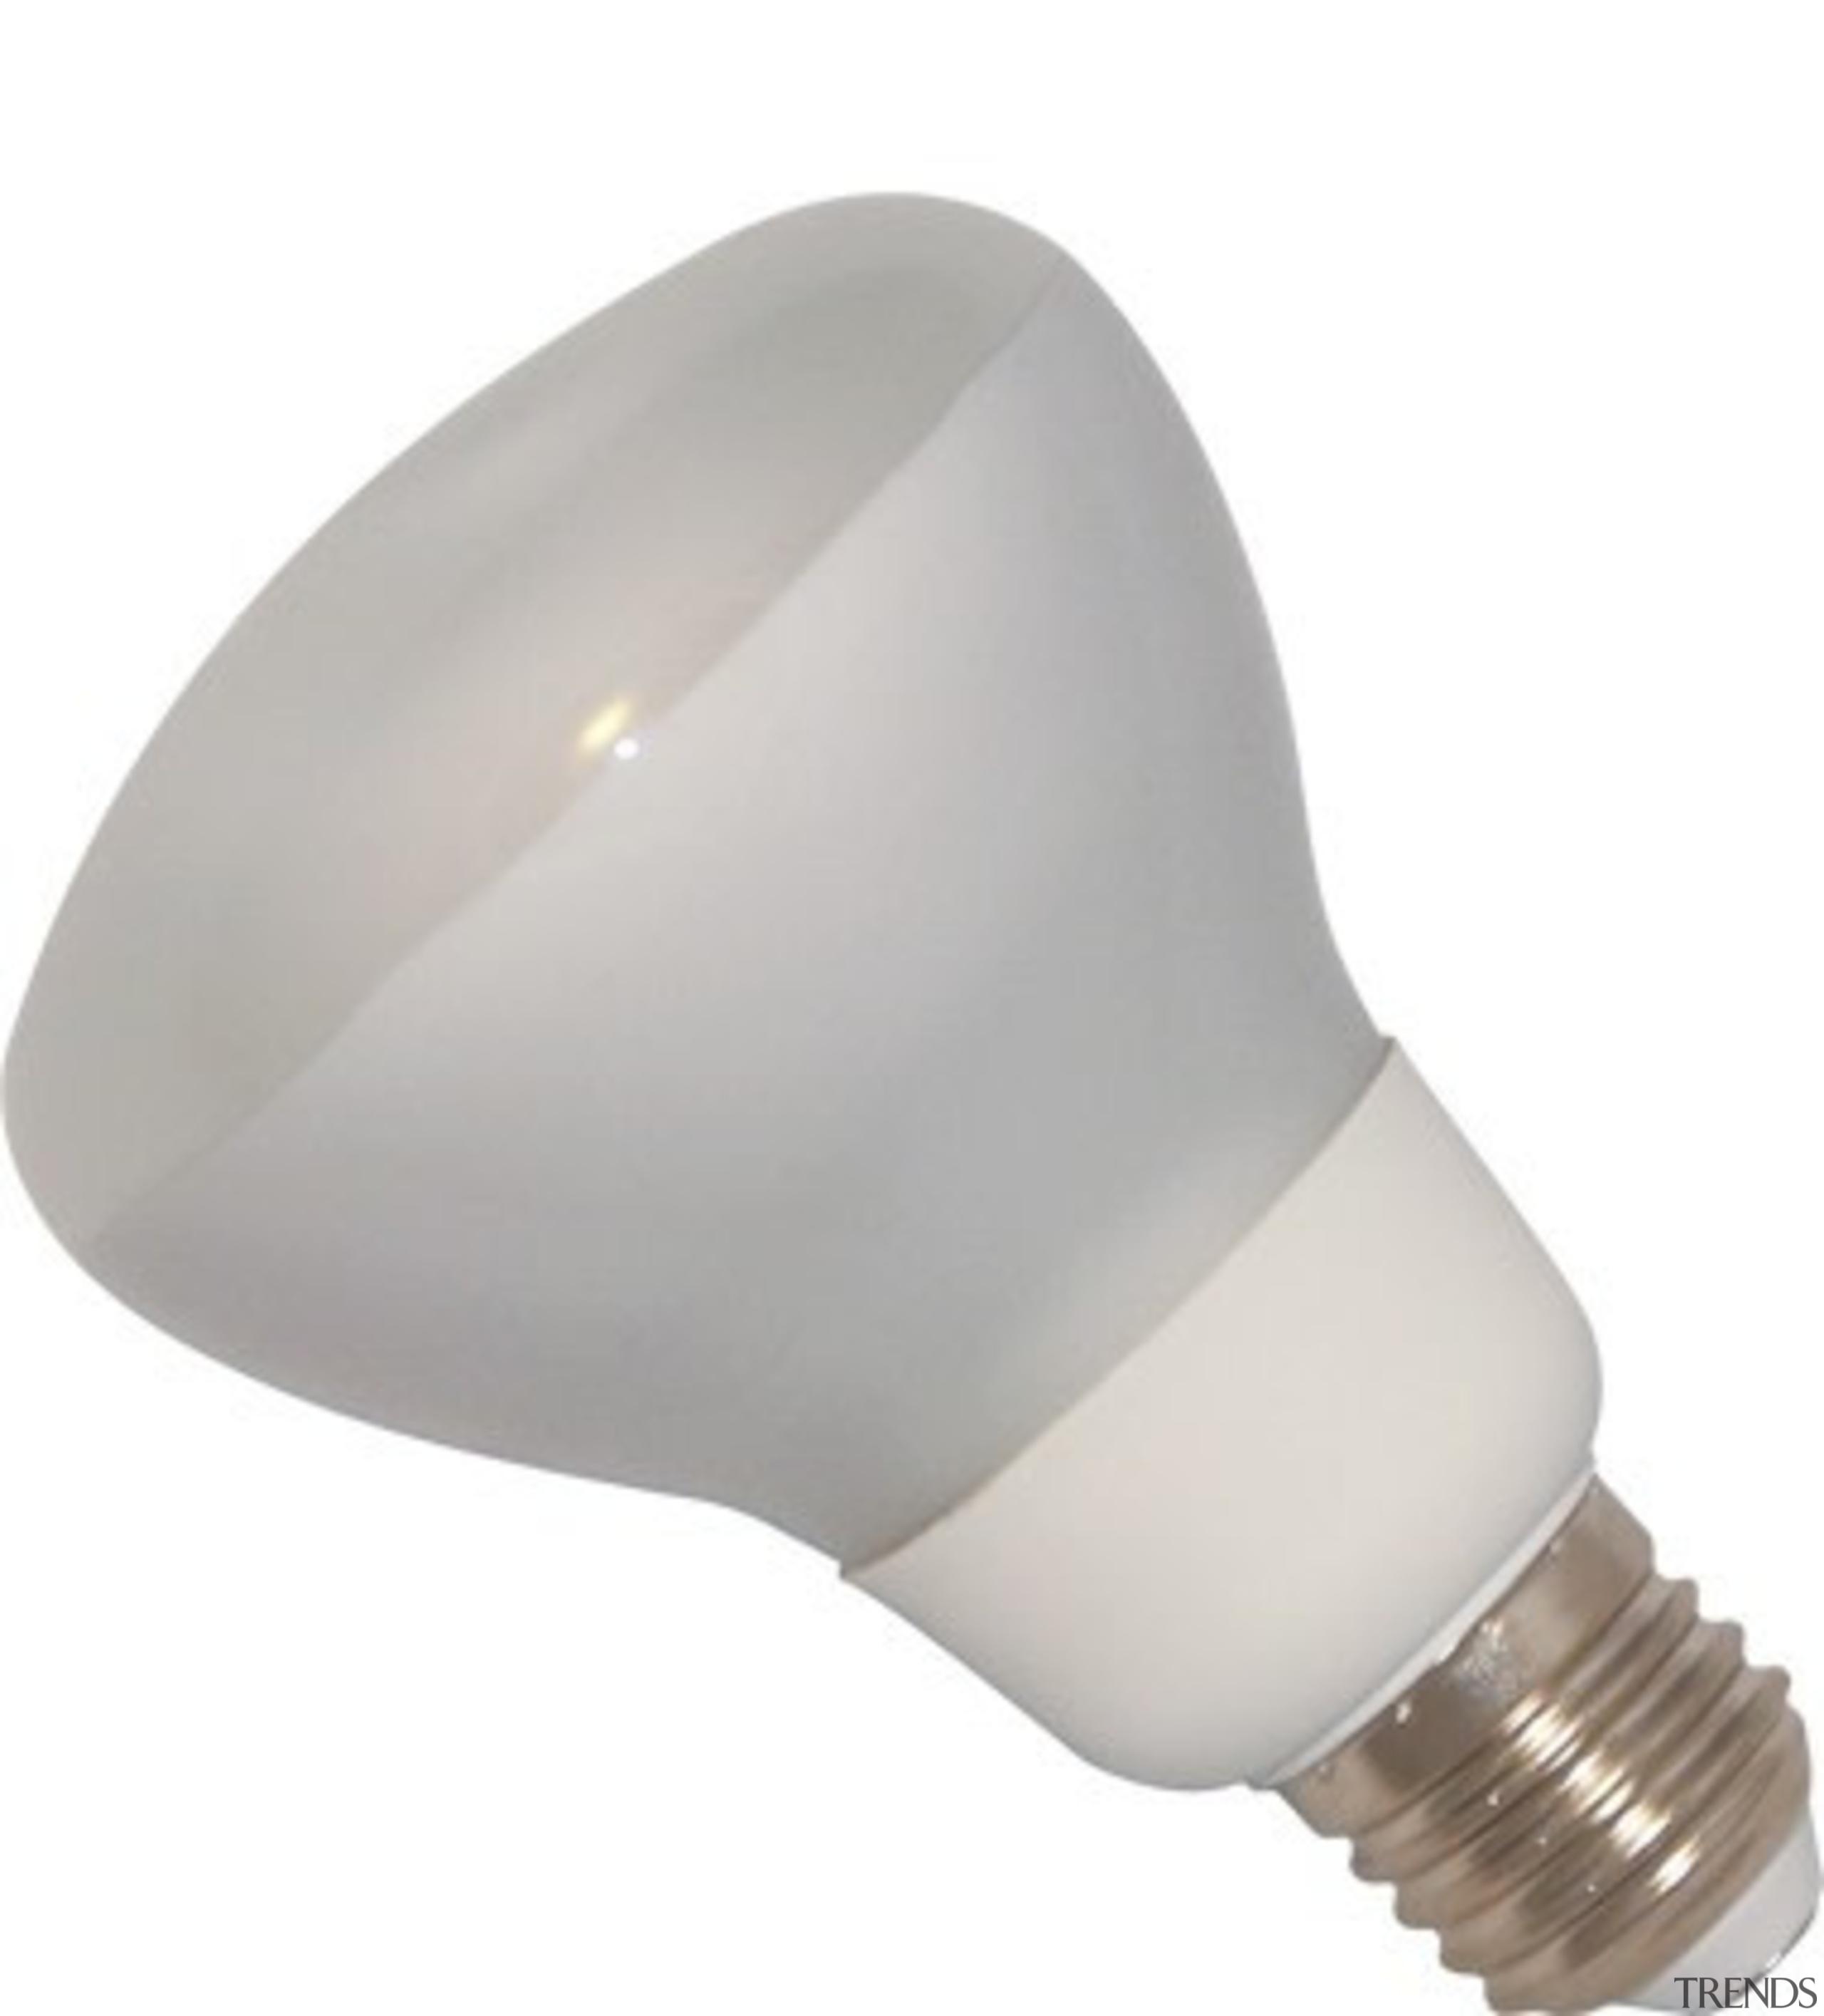 Features15w energy saver8000hrs – 80% energy savingMushroom styleES lighting, product design, white